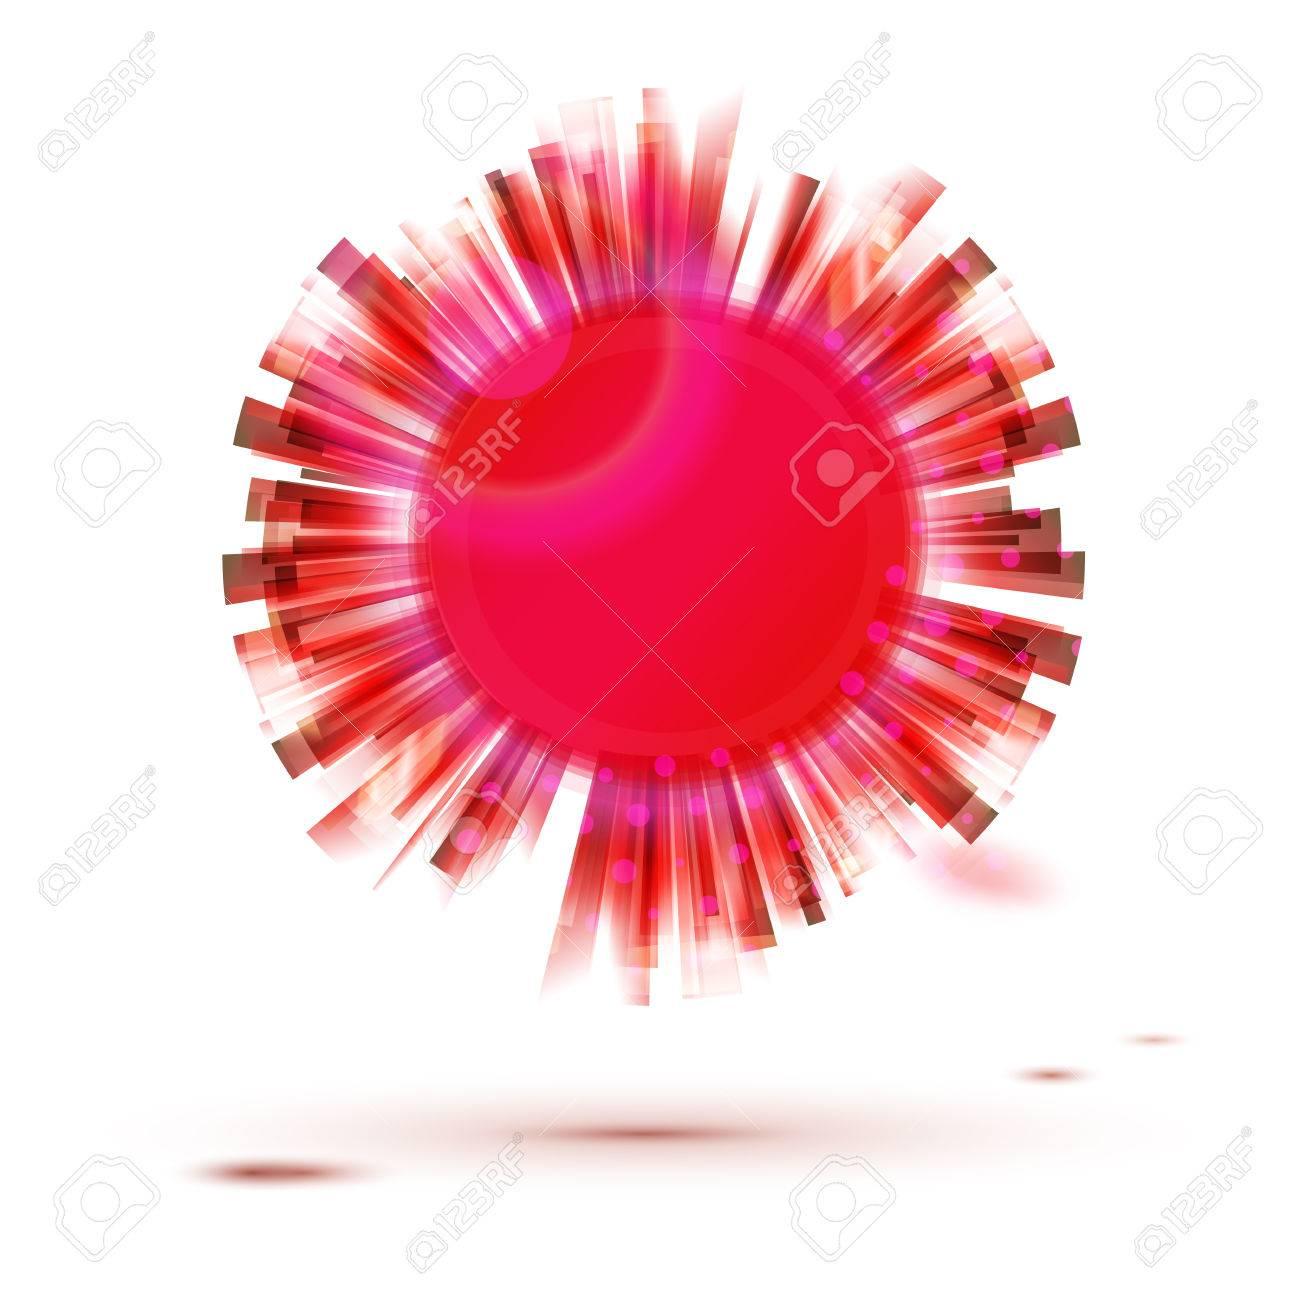 Roter Kreis Kreativen Form Label Zusammenfassung Vektor Emblem